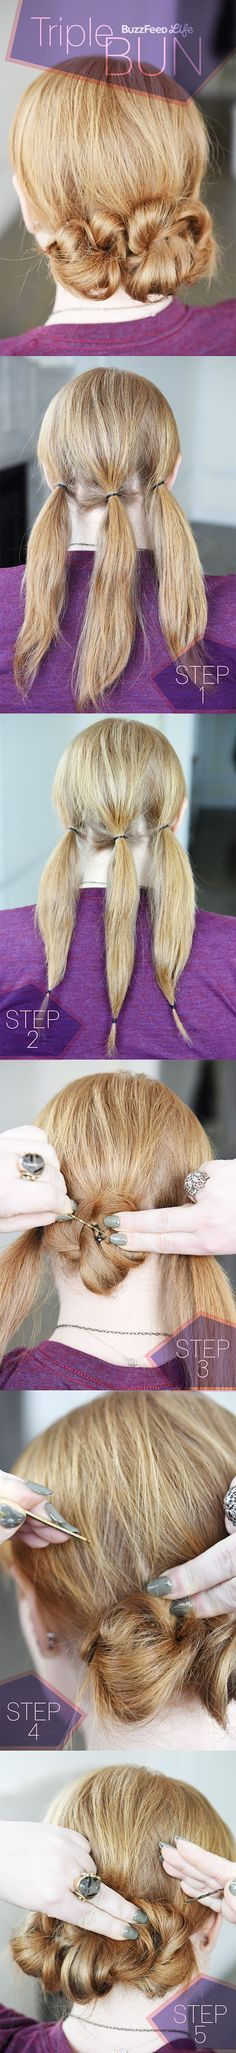 Pin your hair into three mini buns.